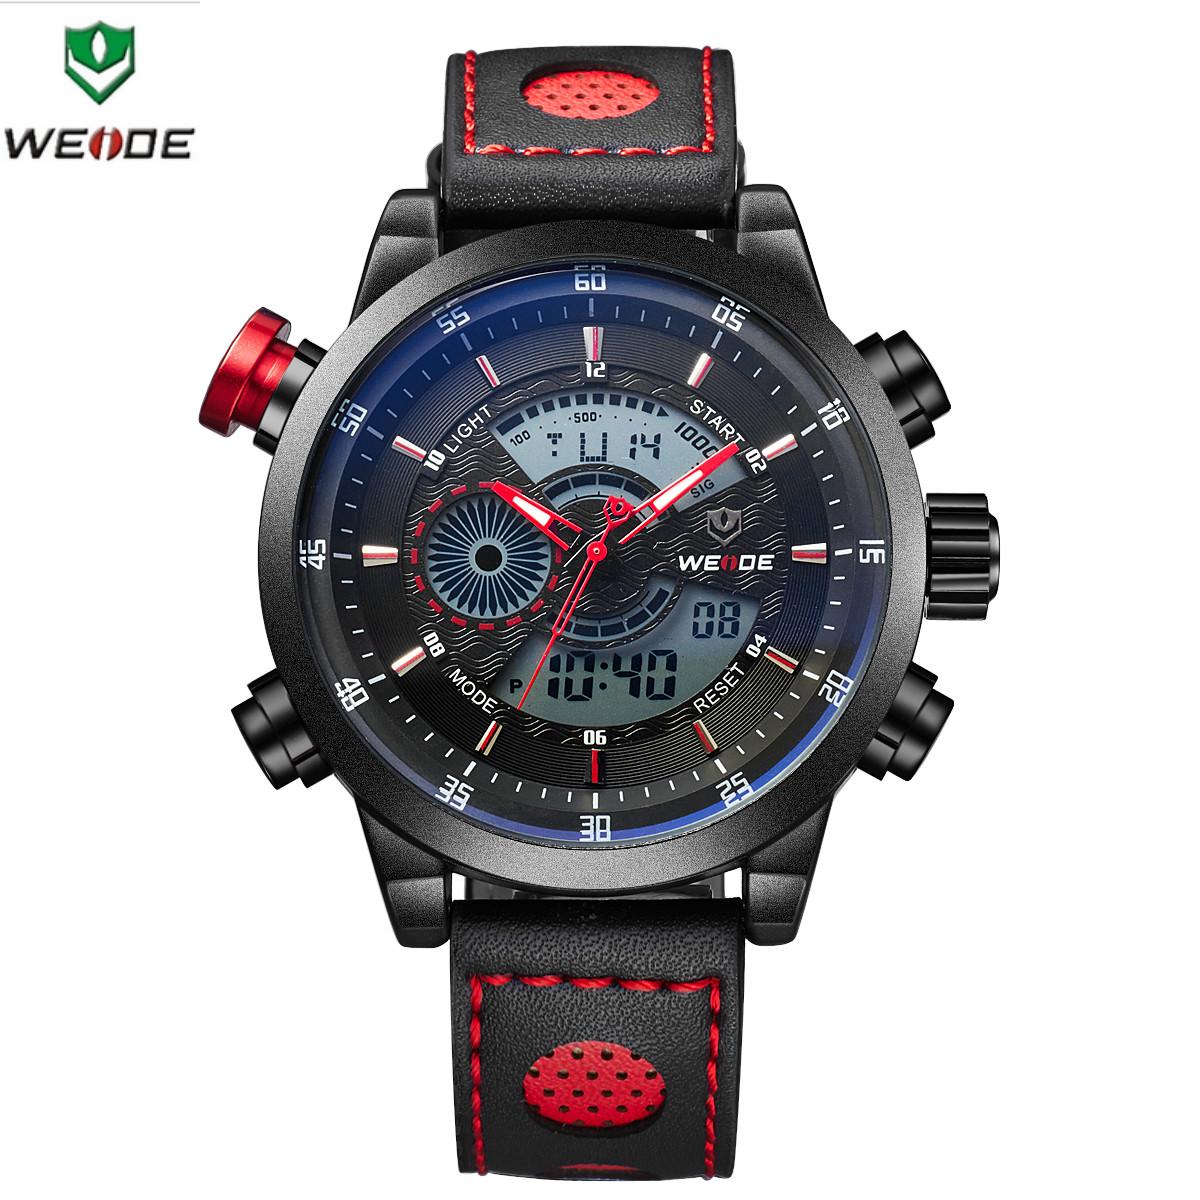 Мужские спортивные часы WEIDE WH-3401 Red